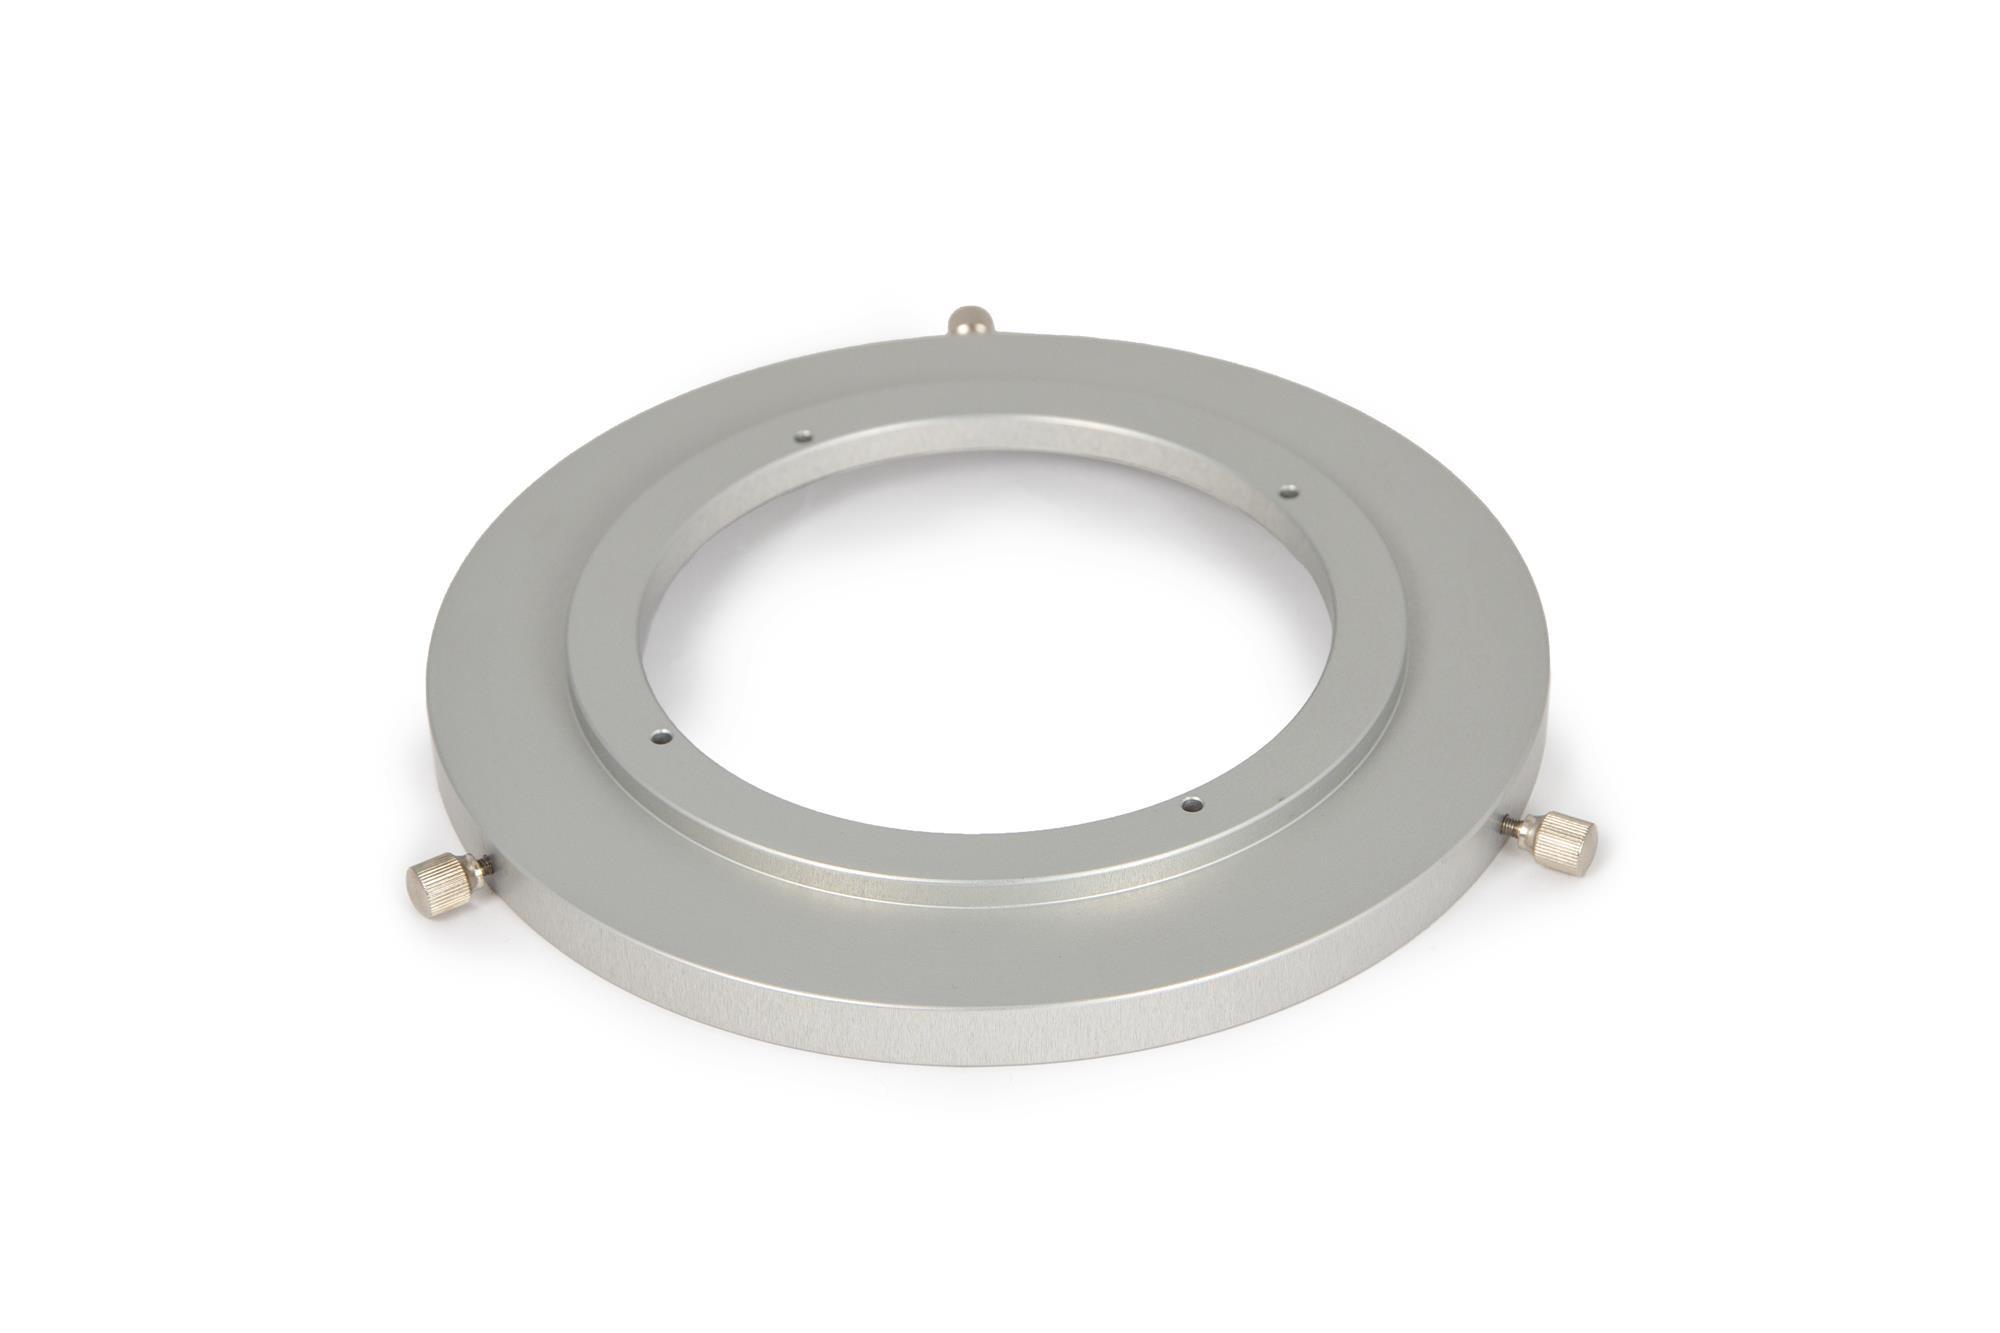 Detachable sun diaphragm holder for D-ERF 135 - 160 filter-frames